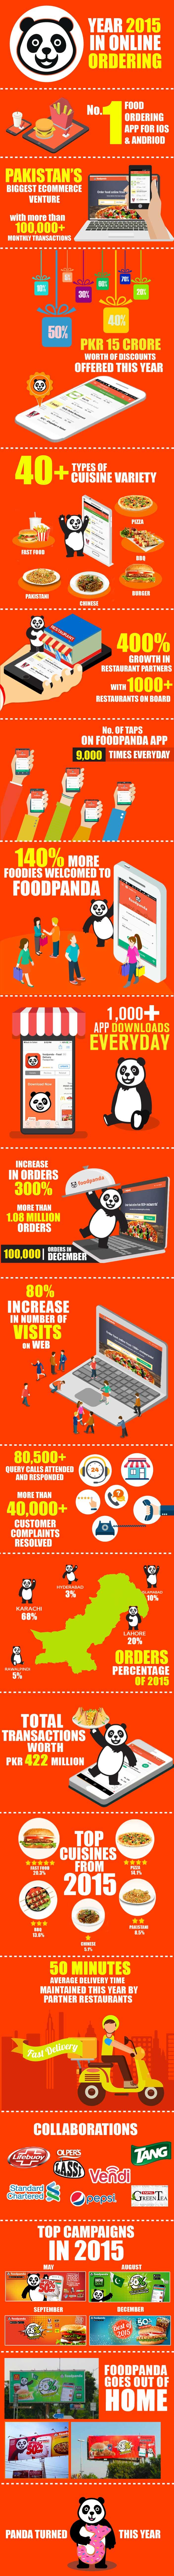 foodpanda-Infographic